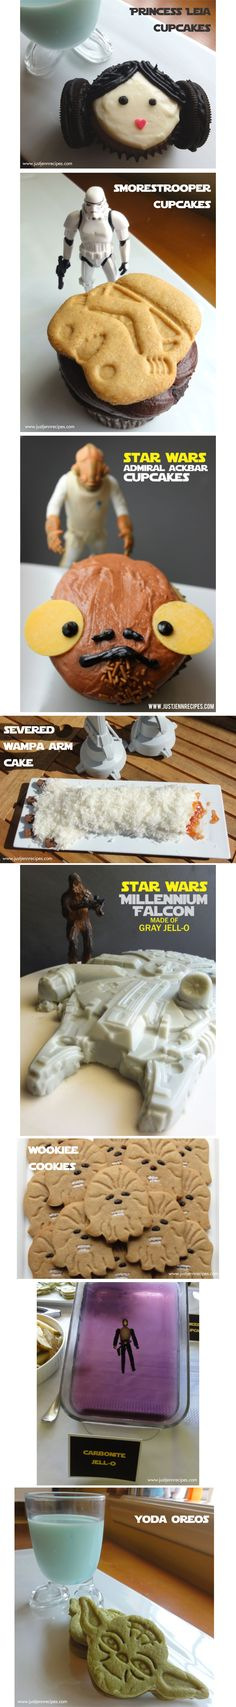 Star Wars recipes for May The 4th l justjennrecipes.com